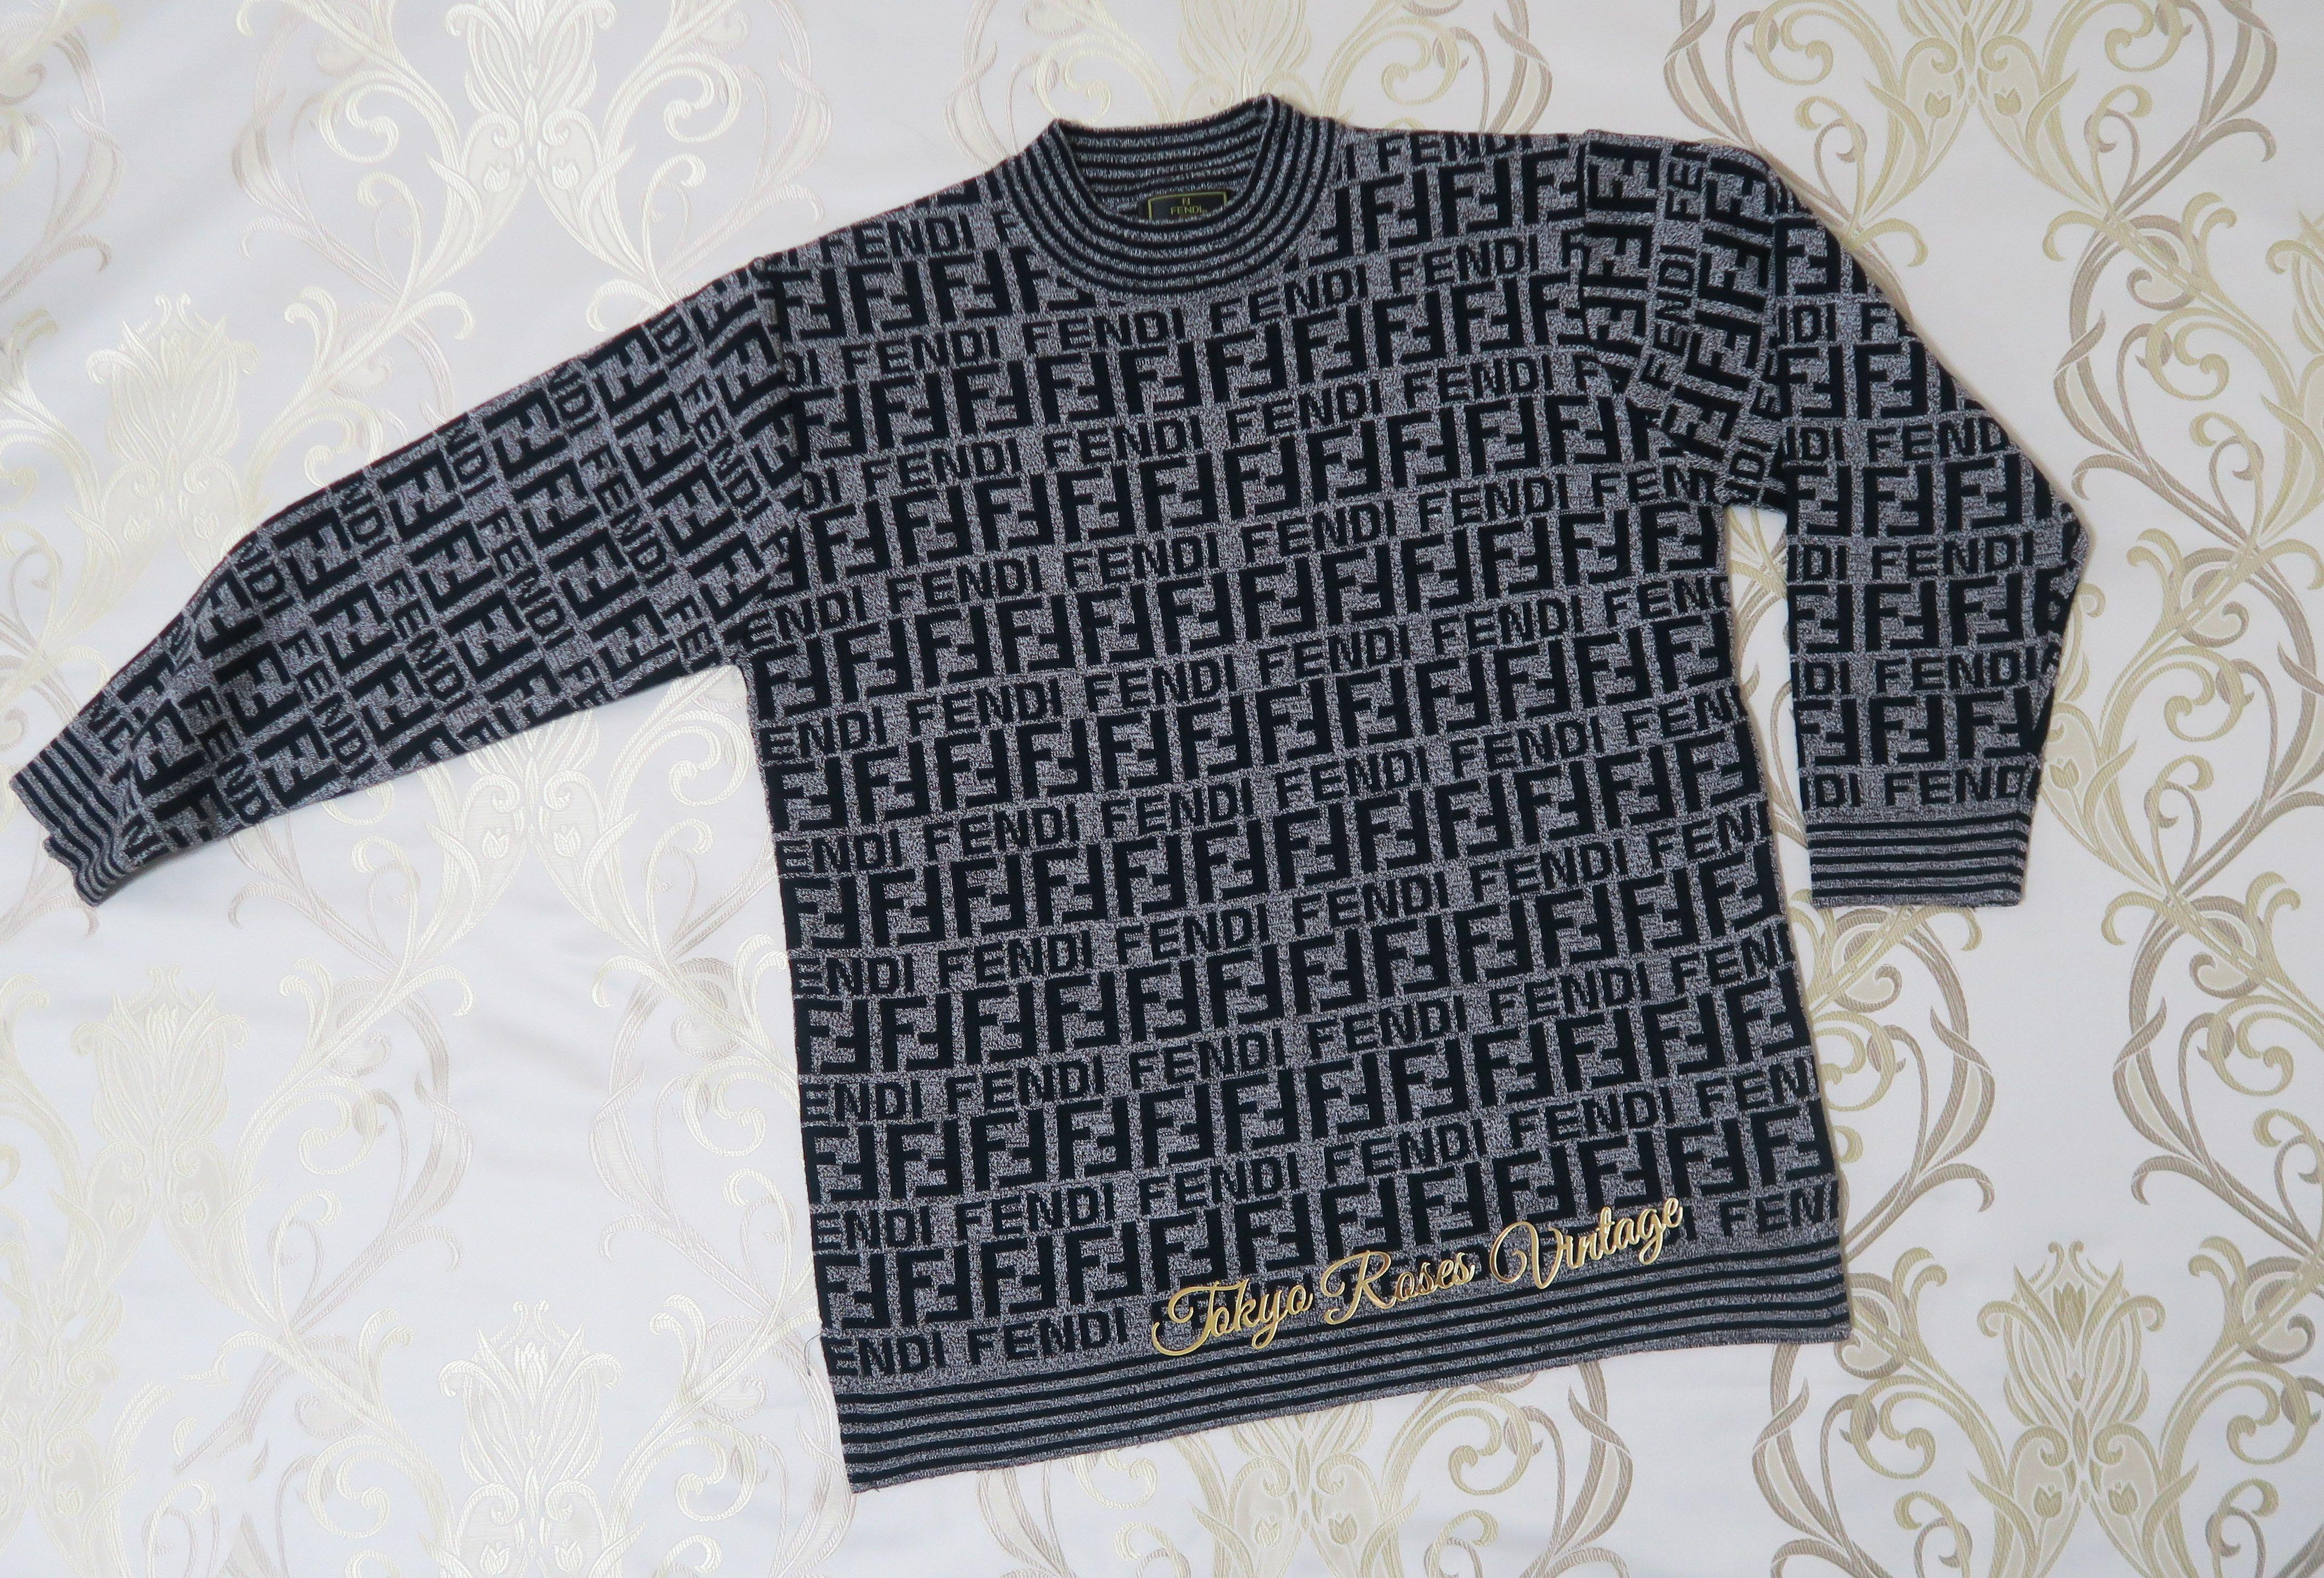 b44367c89b715e Fendi FF Logo Print Grey Knit Sweater | Vintage Fendi FF logo Zucca ...